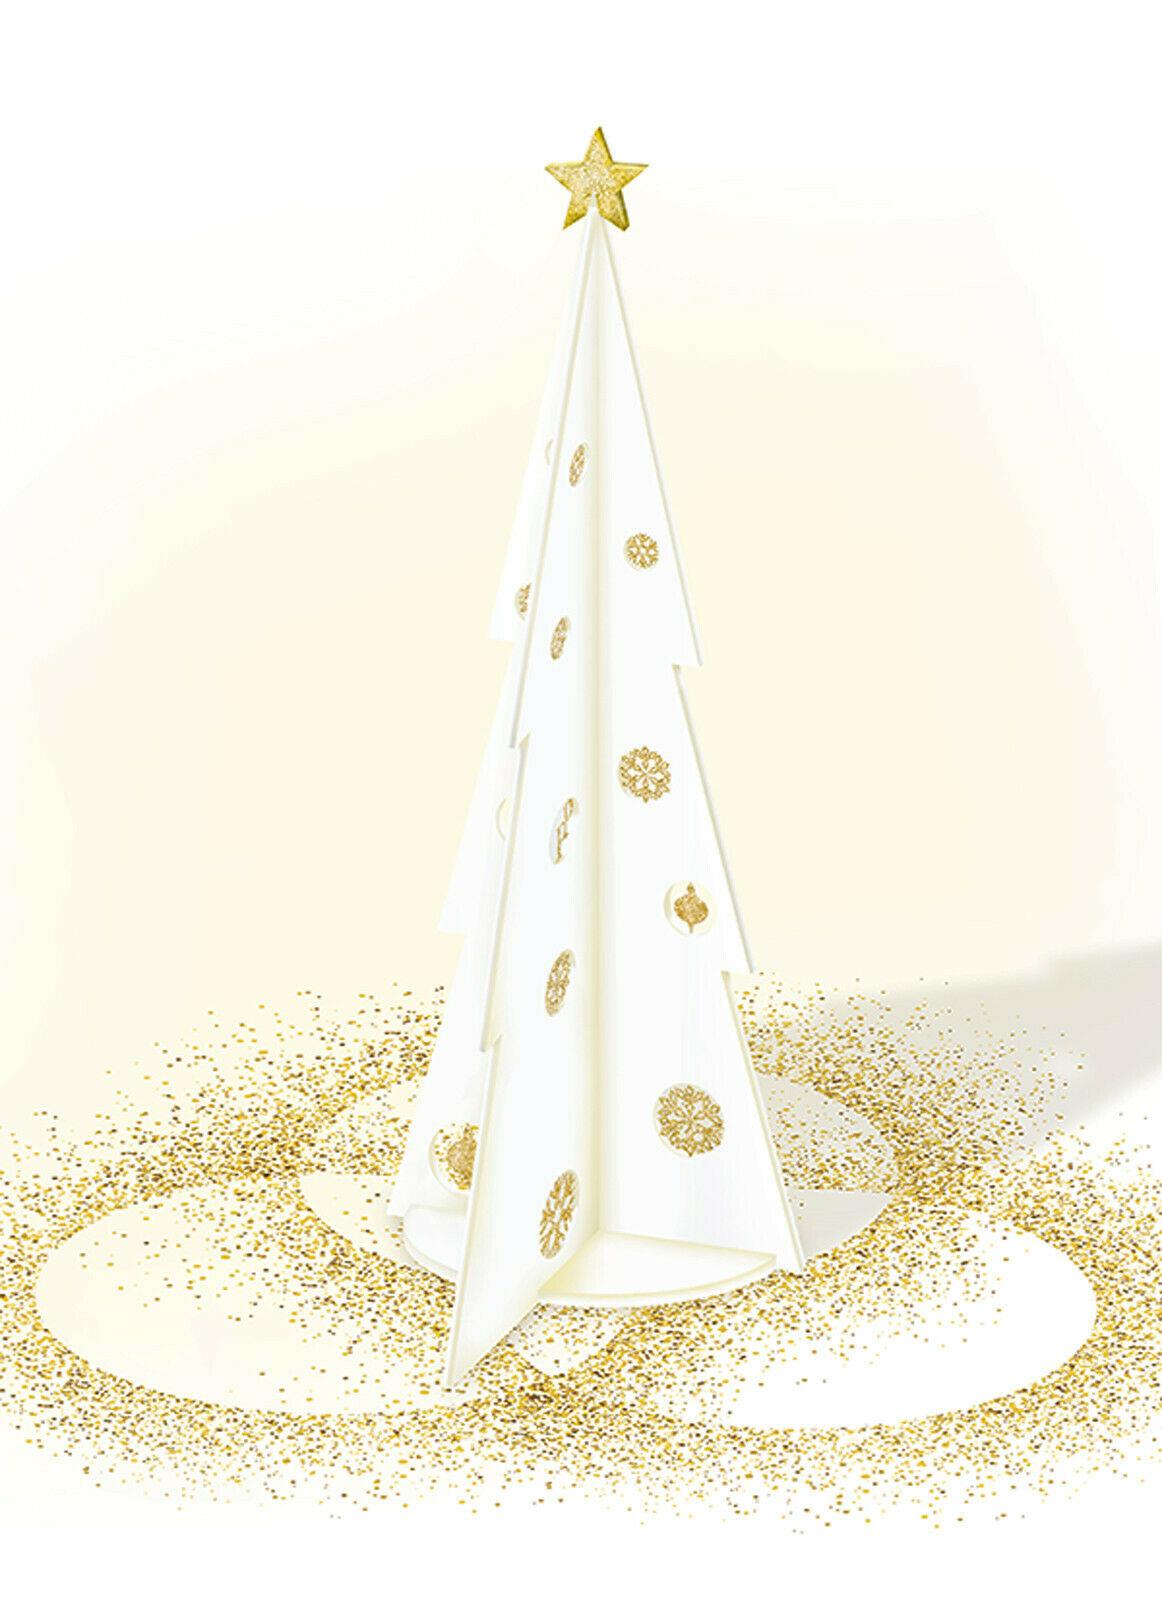 Fashion Royalty Poppy Golden Holiday 2017 英國風情假日PP娃娃